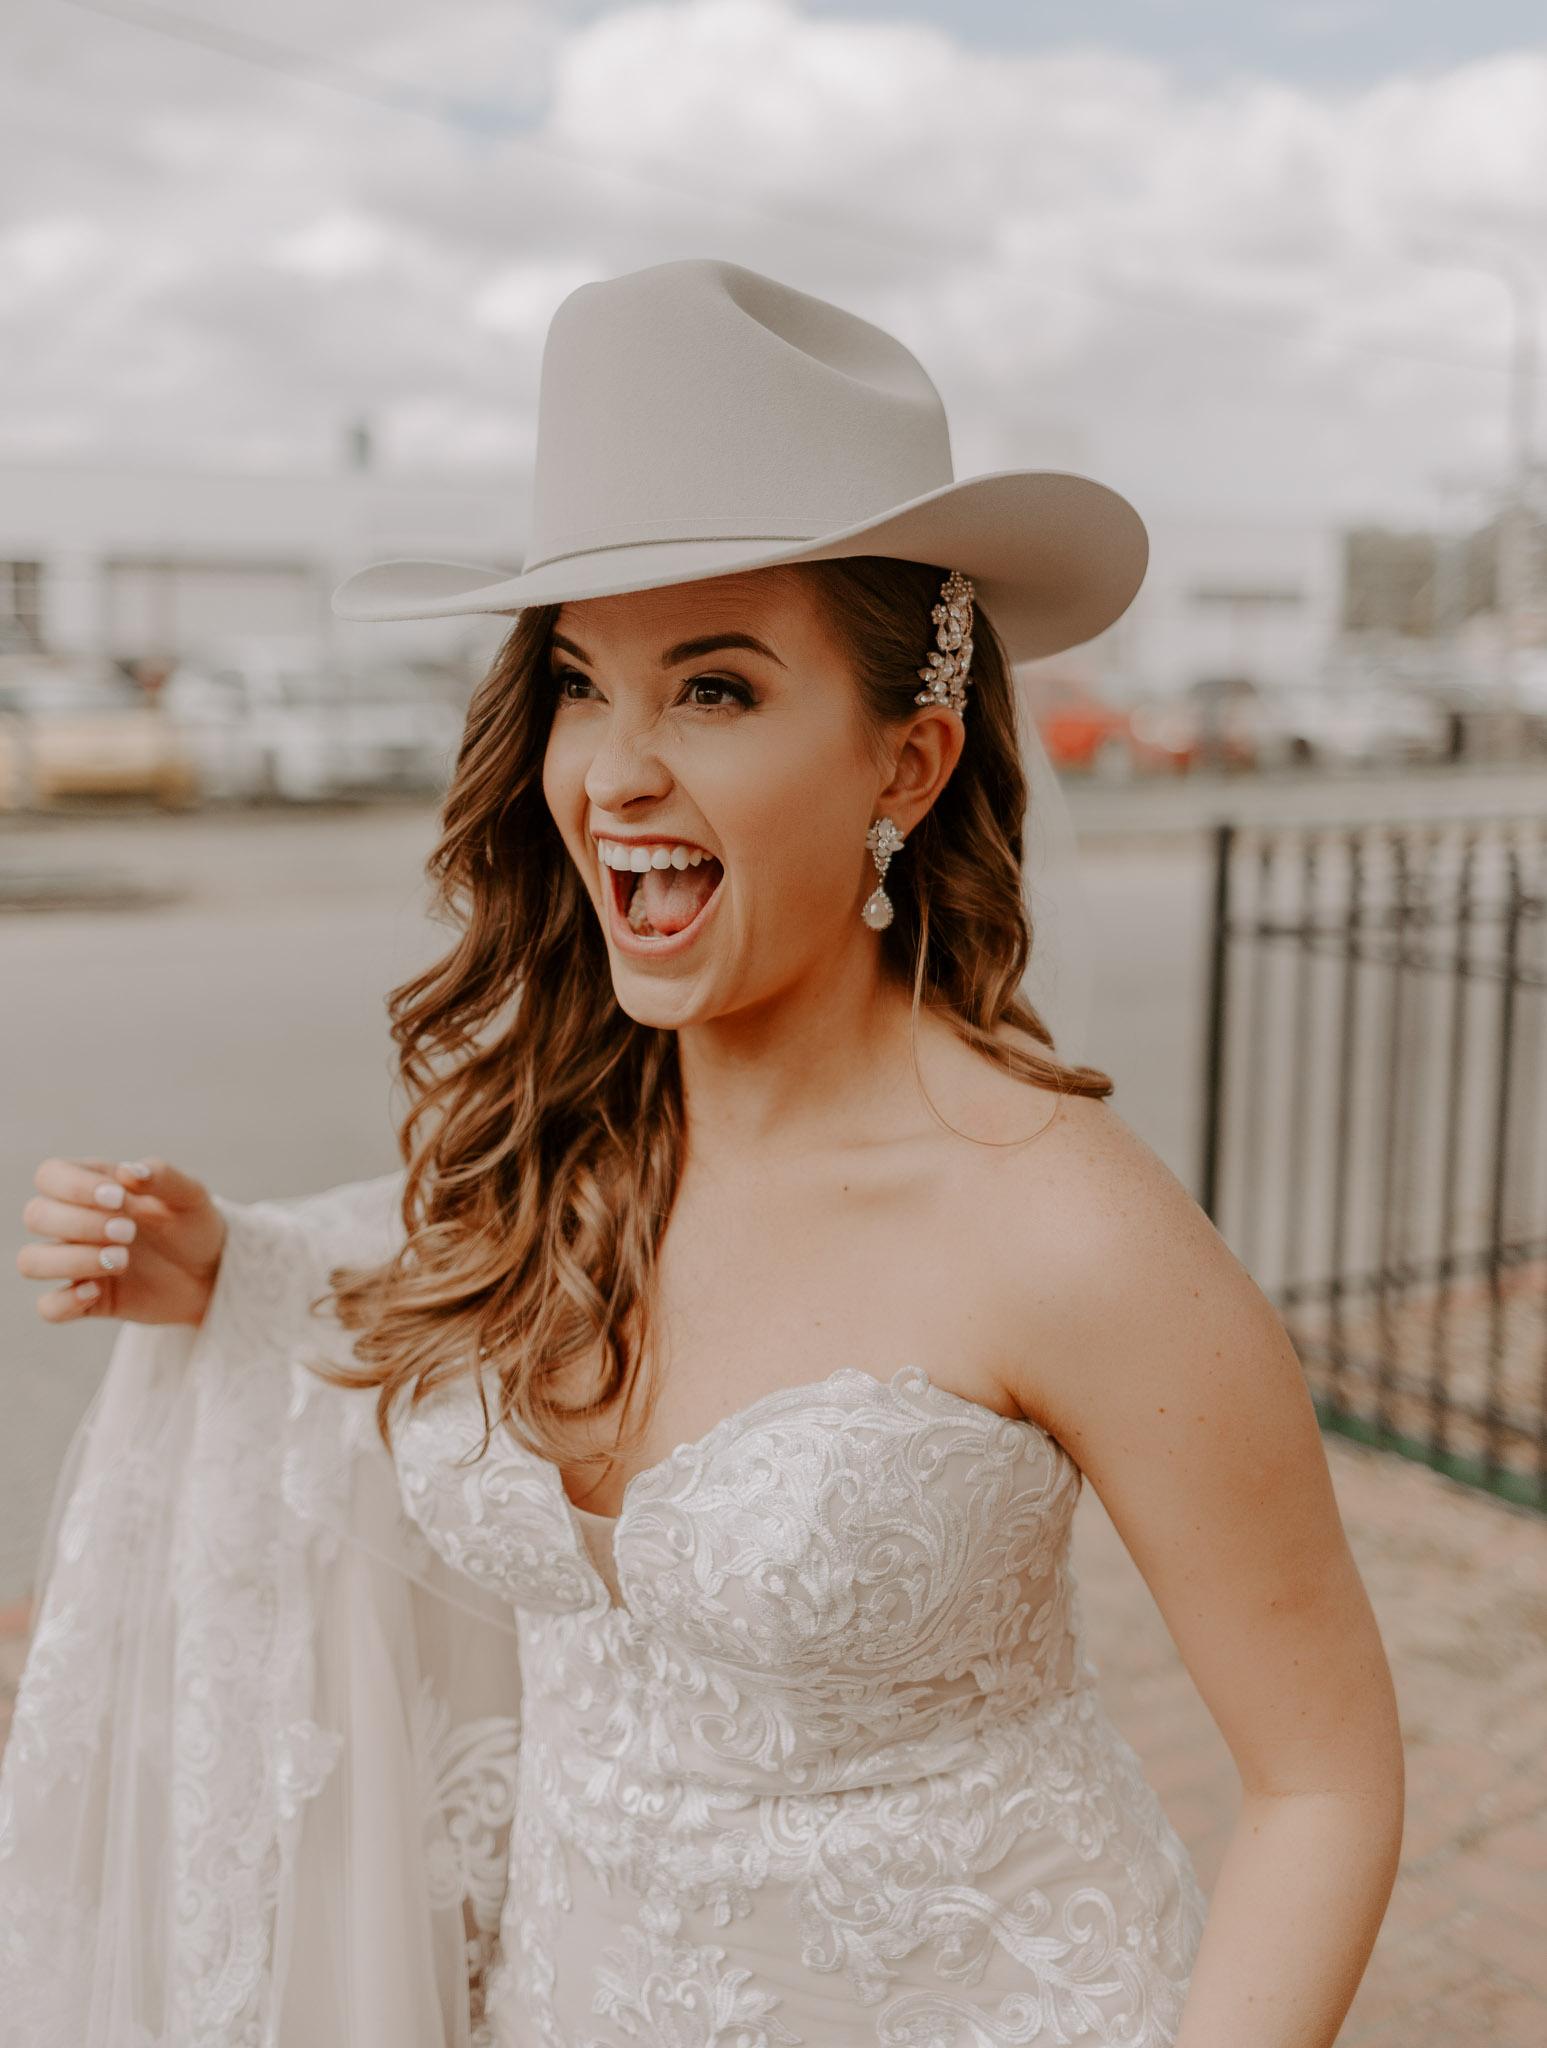 Catholic Houston Texas Flare Wedding Bell Tower-7958.jpg